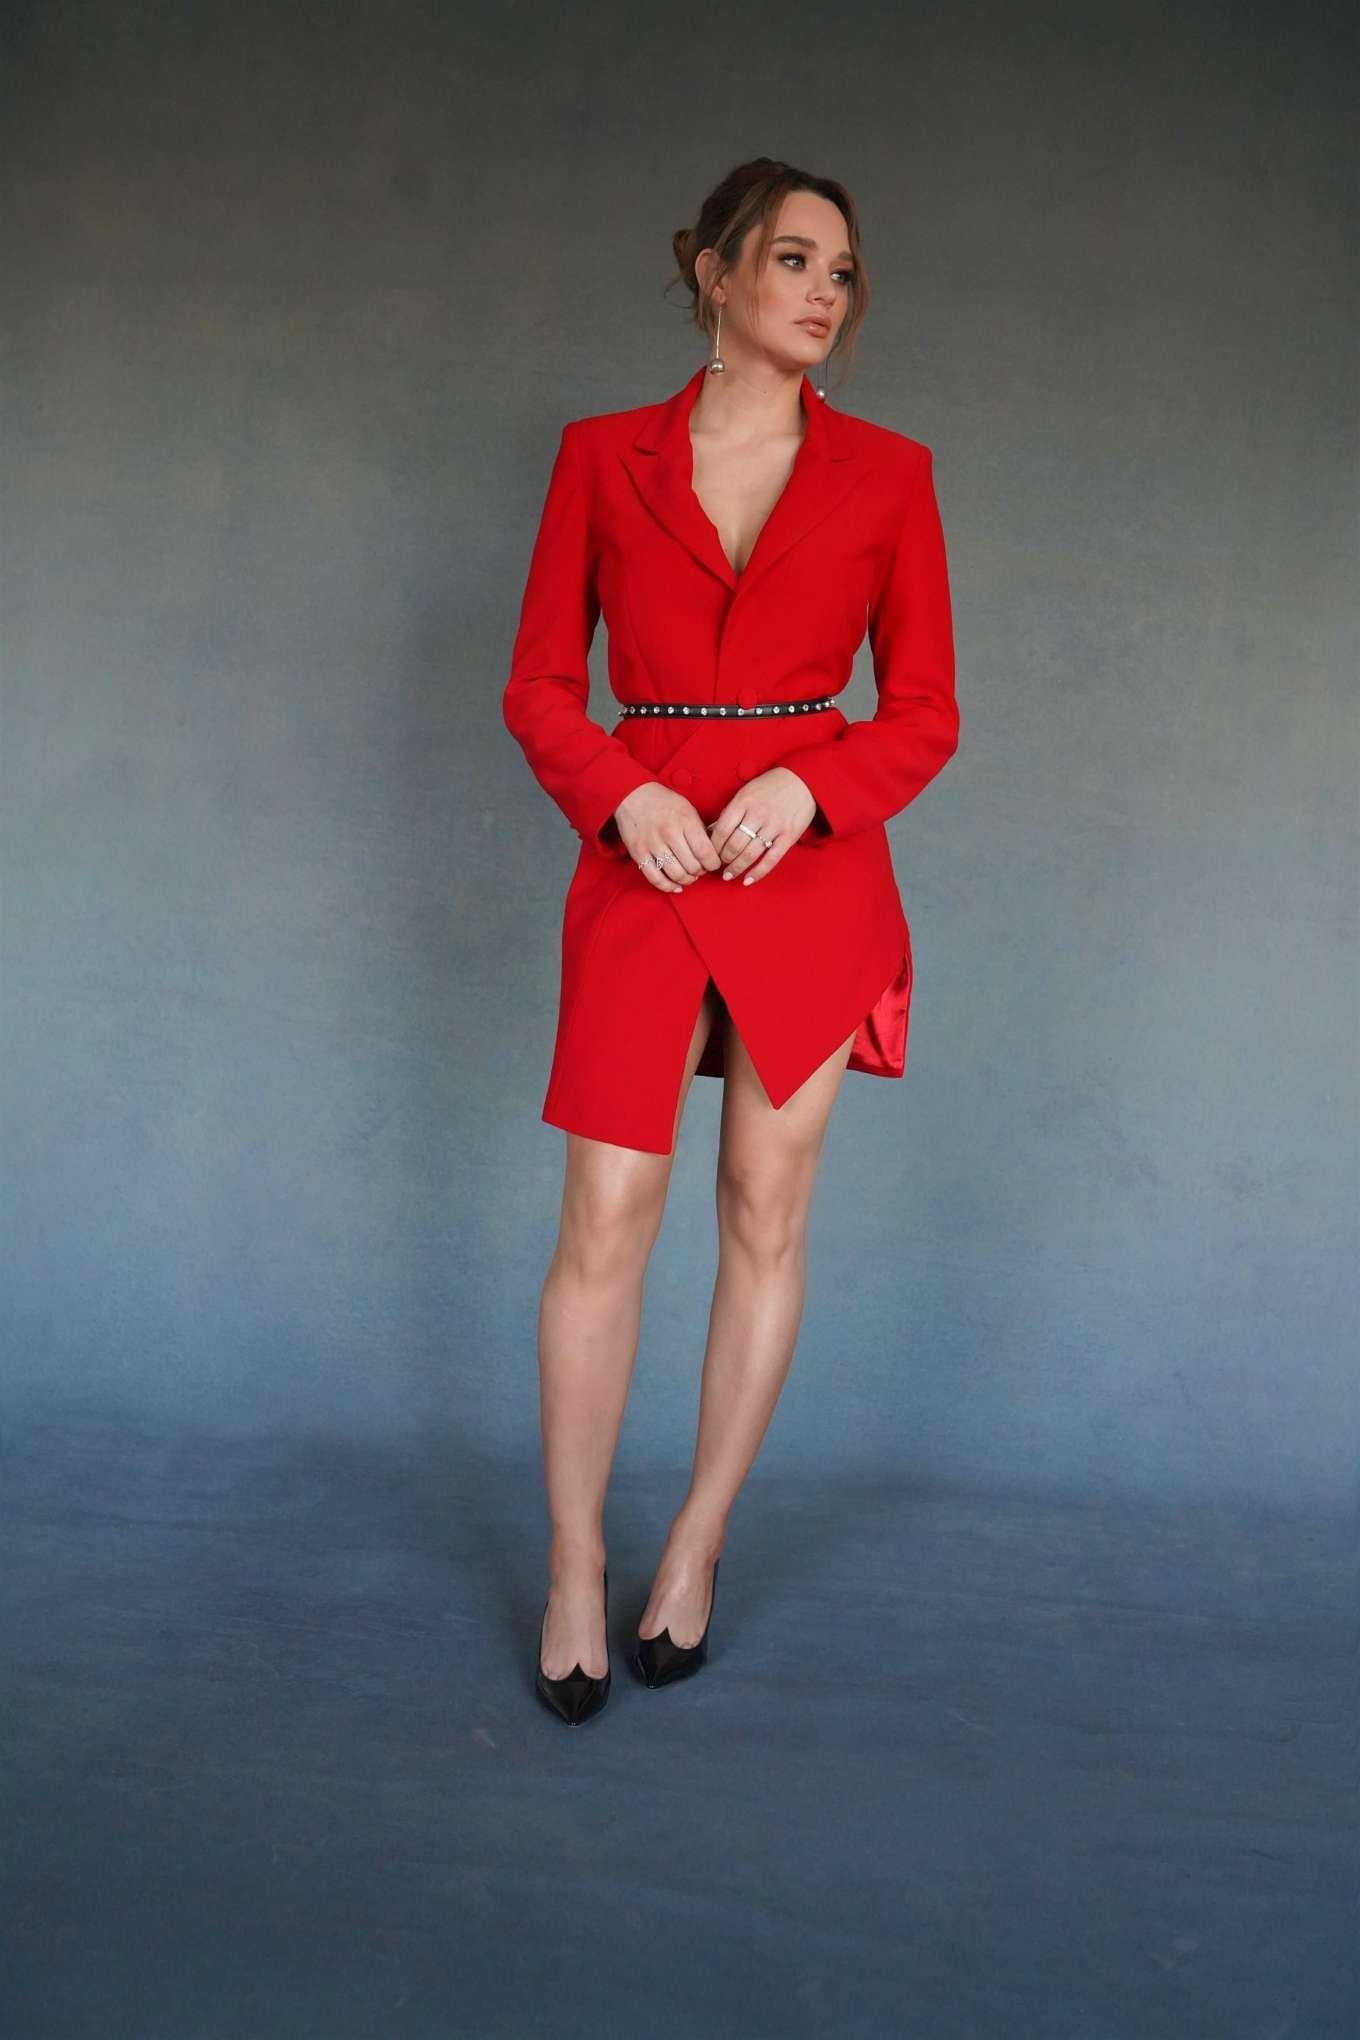 Hunter King 2019 : Hunter King – Wearing a Nathalie Karam red dress for a photoshoot at PCA 2019 in LA-05